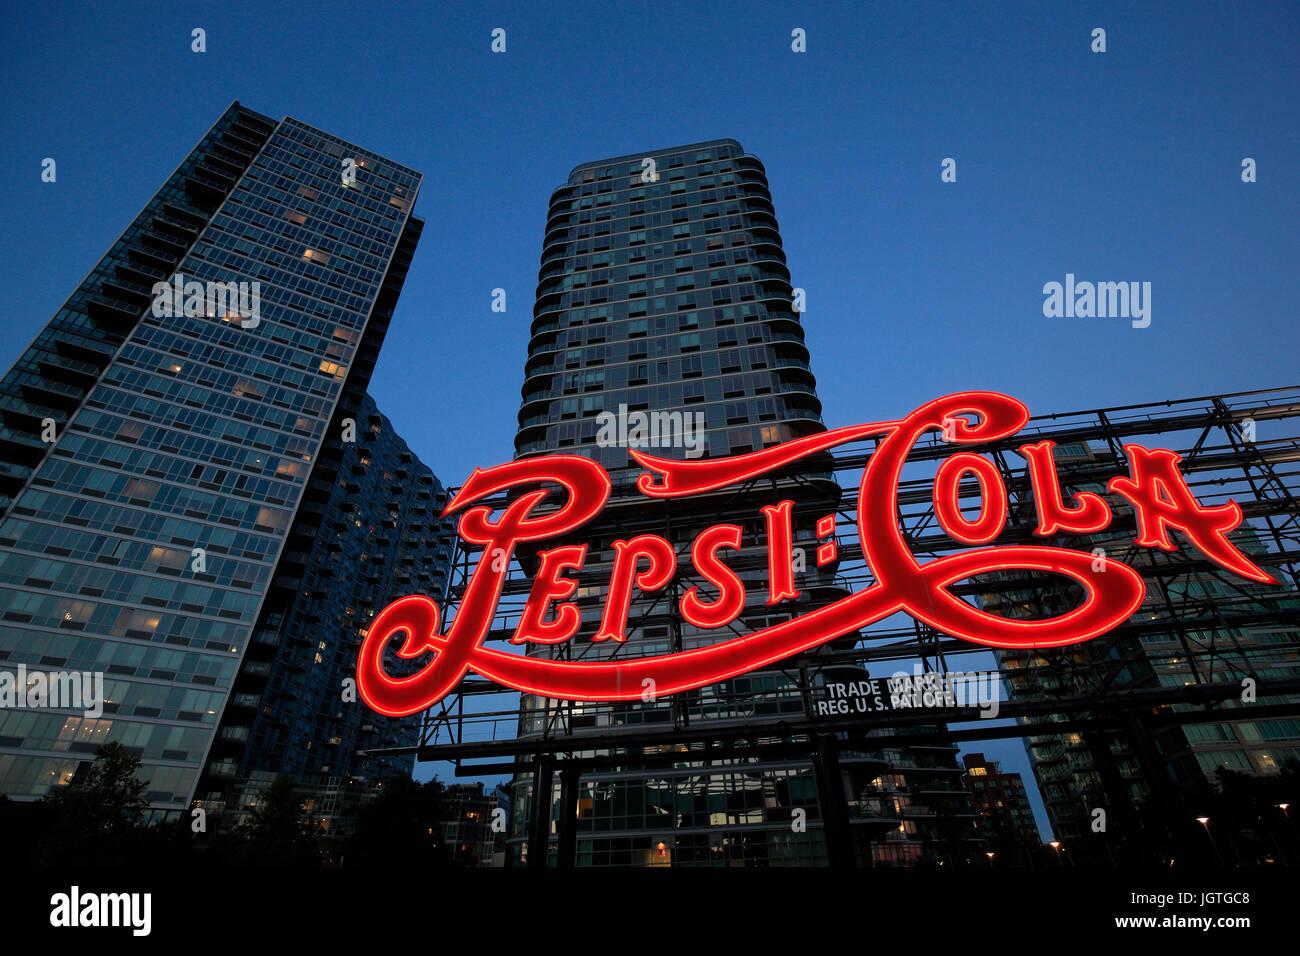 Wiring Diagram For Pepsi Sign Schematics Diagrams Traffic Light Logo Stock Photos Images Alamy Rh Com Powder Coating Oven